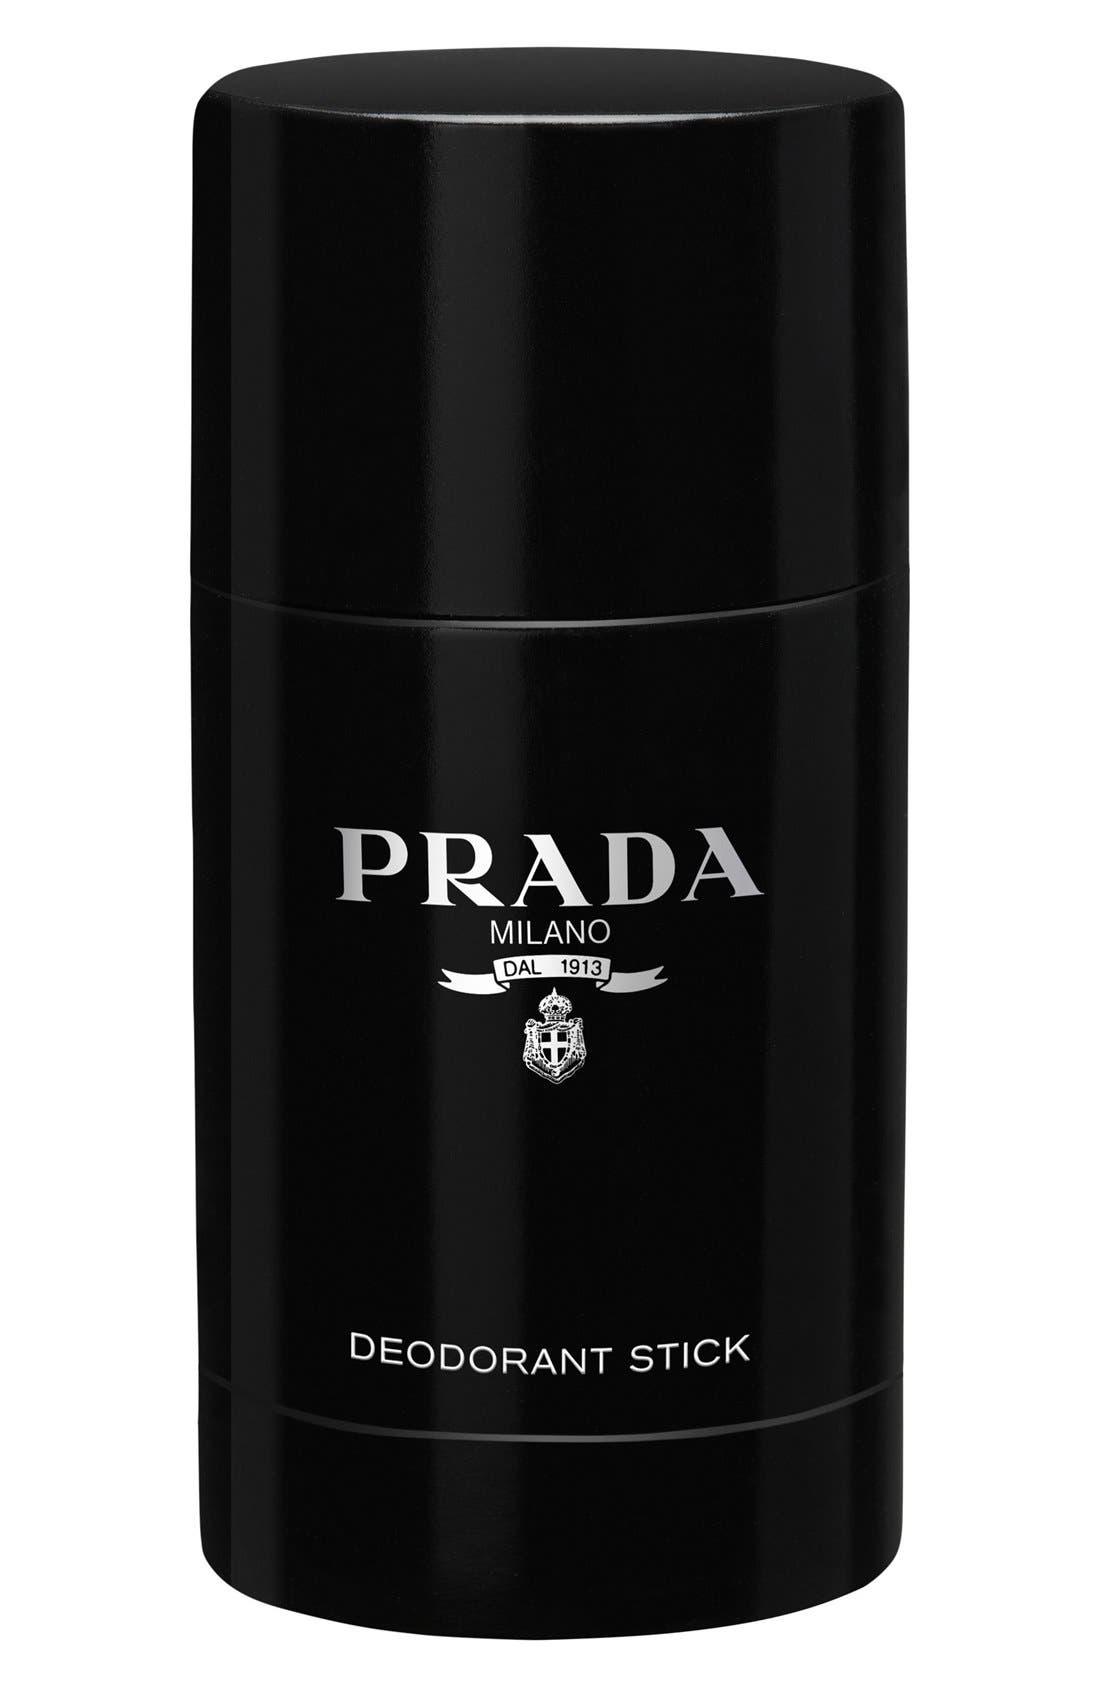 Prada 'L'Homme Prada' Deodorant Stick